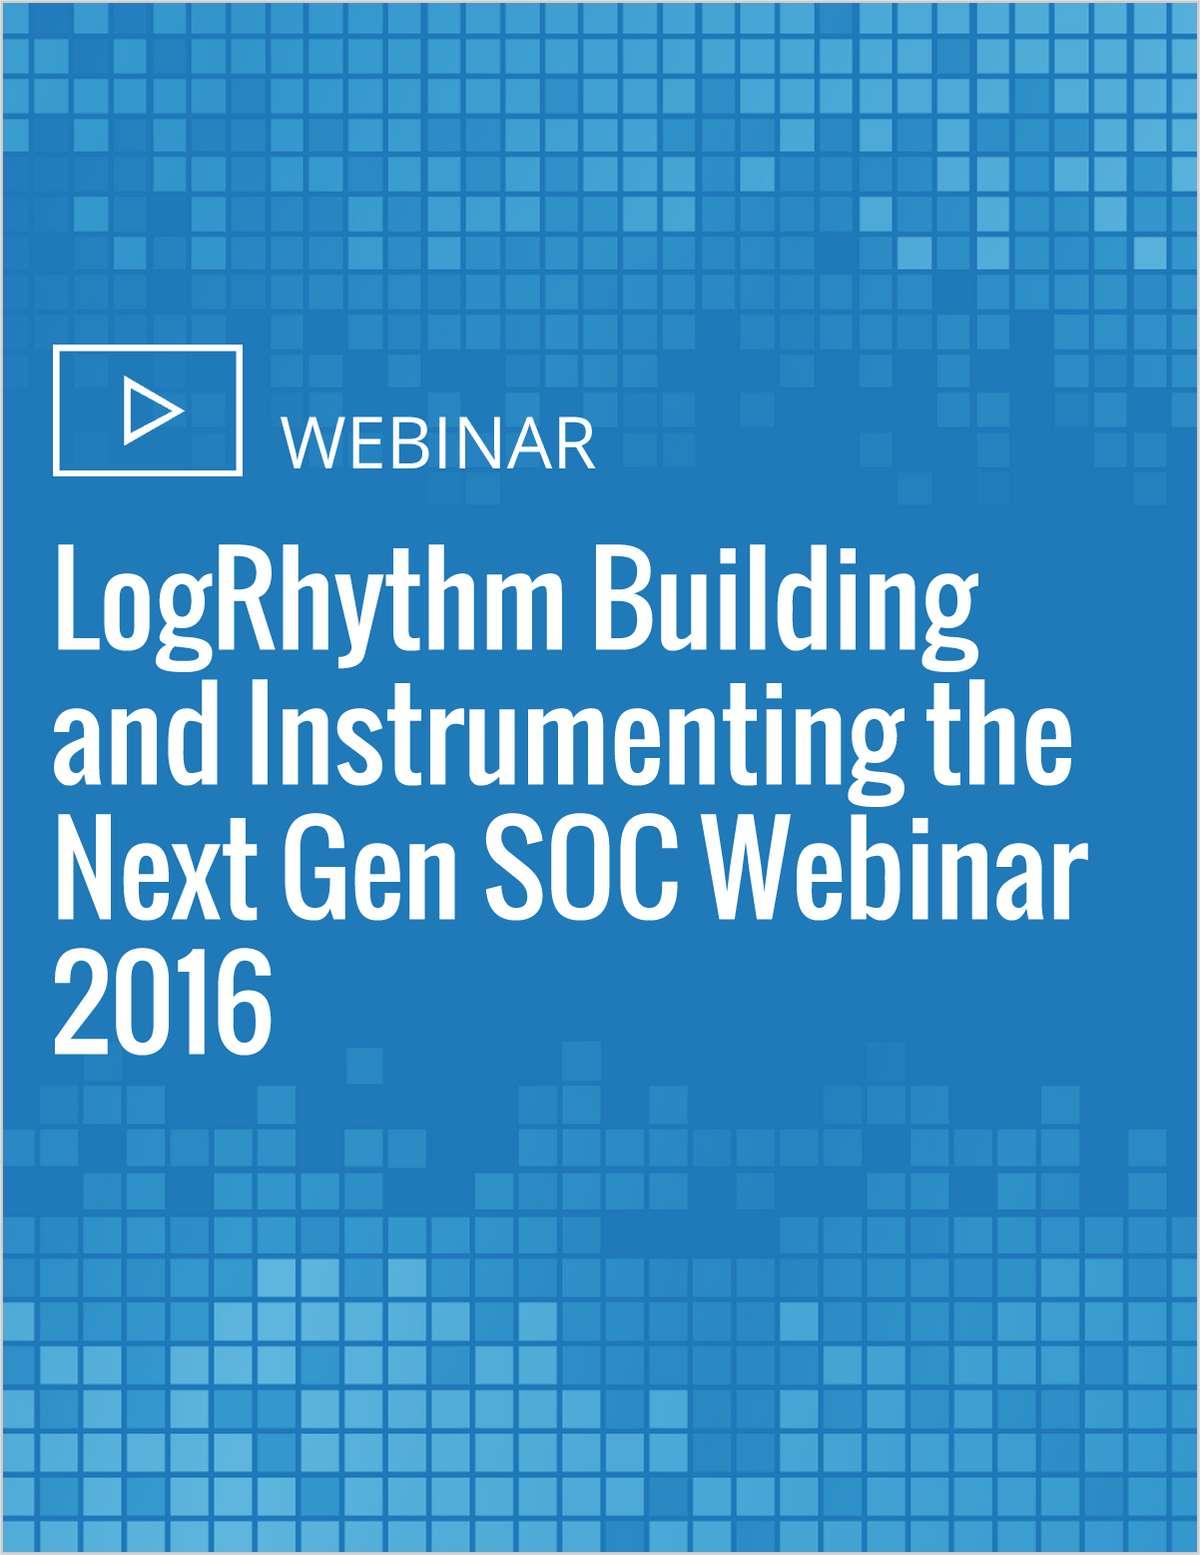 LogRhythm Building and Instrumenting the Next Gen SOC Webinar 2016